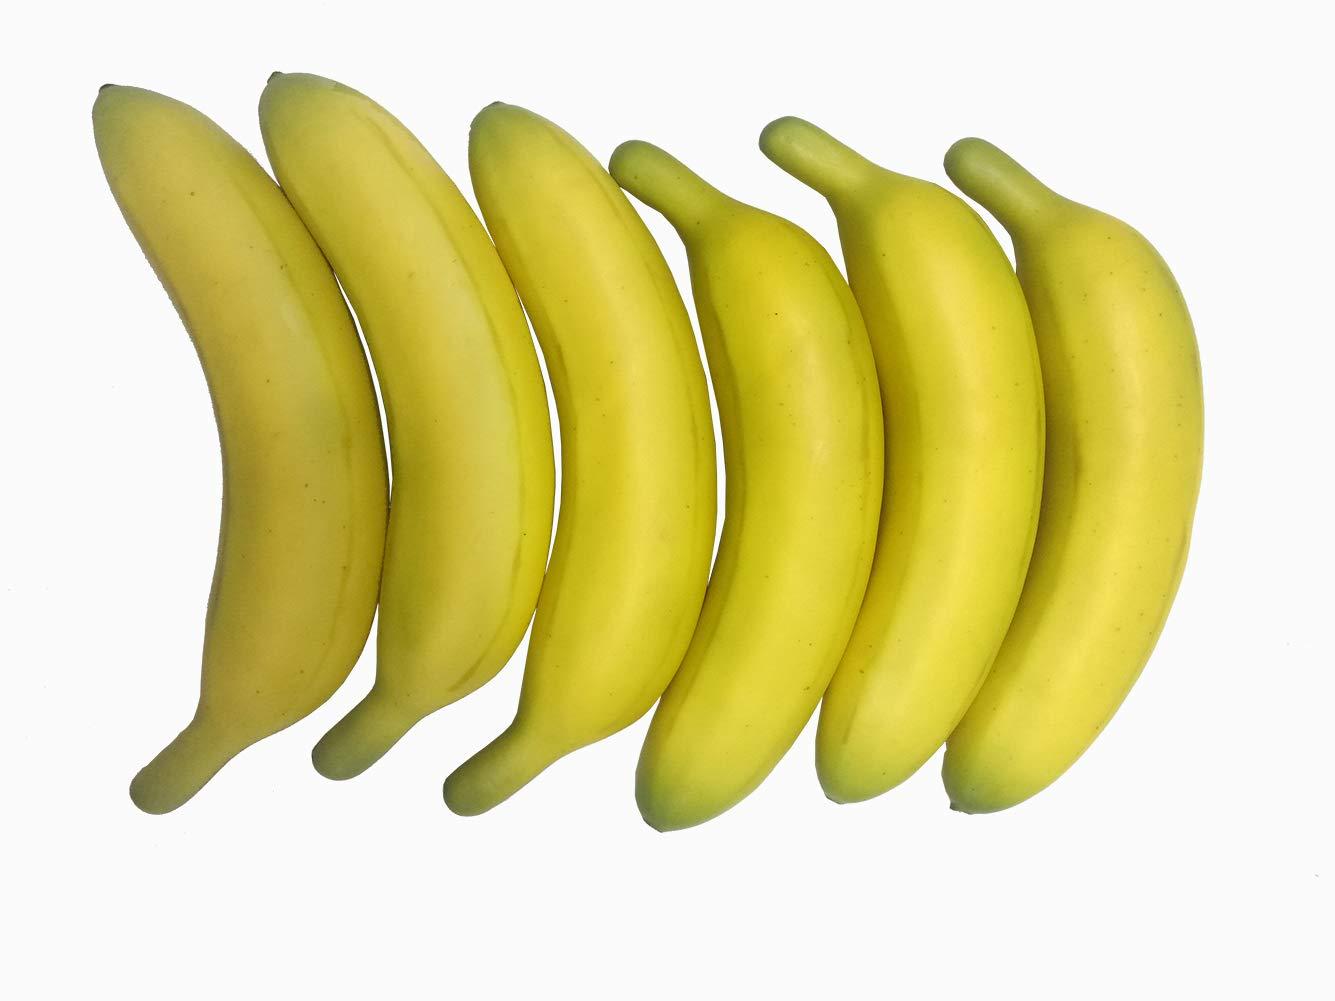 6pcs-Set-Fake-Banana-Artificial-Fruit-Lifelike-Yellow-Bananas-for-Home-Kitchen-Store-Decoration